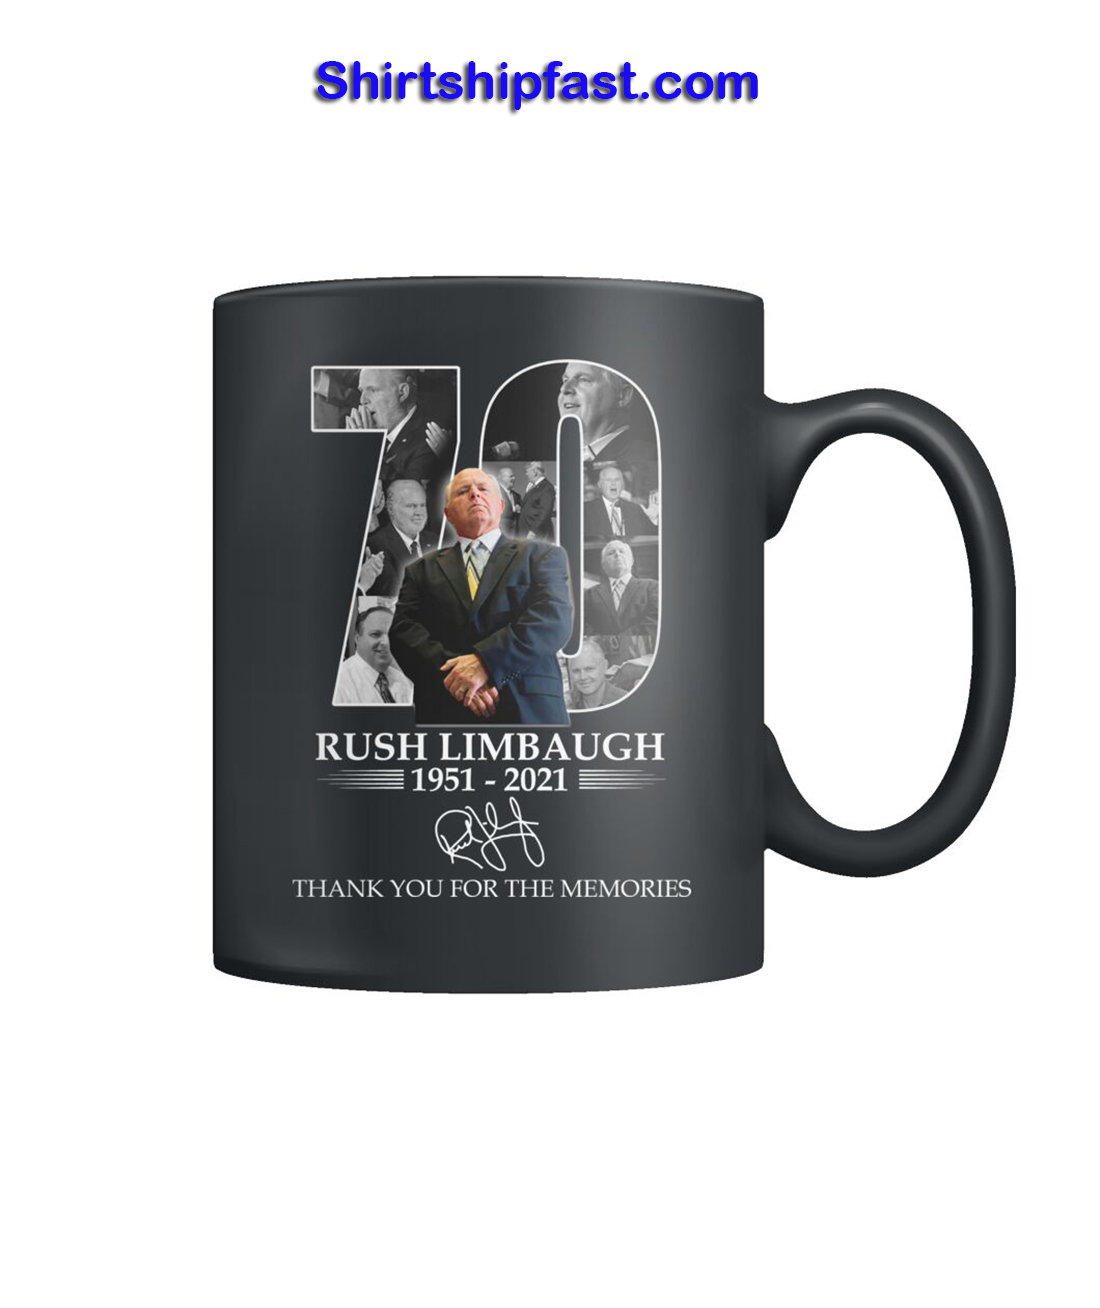 Rush Limbaugh signature thanks for the memories mug